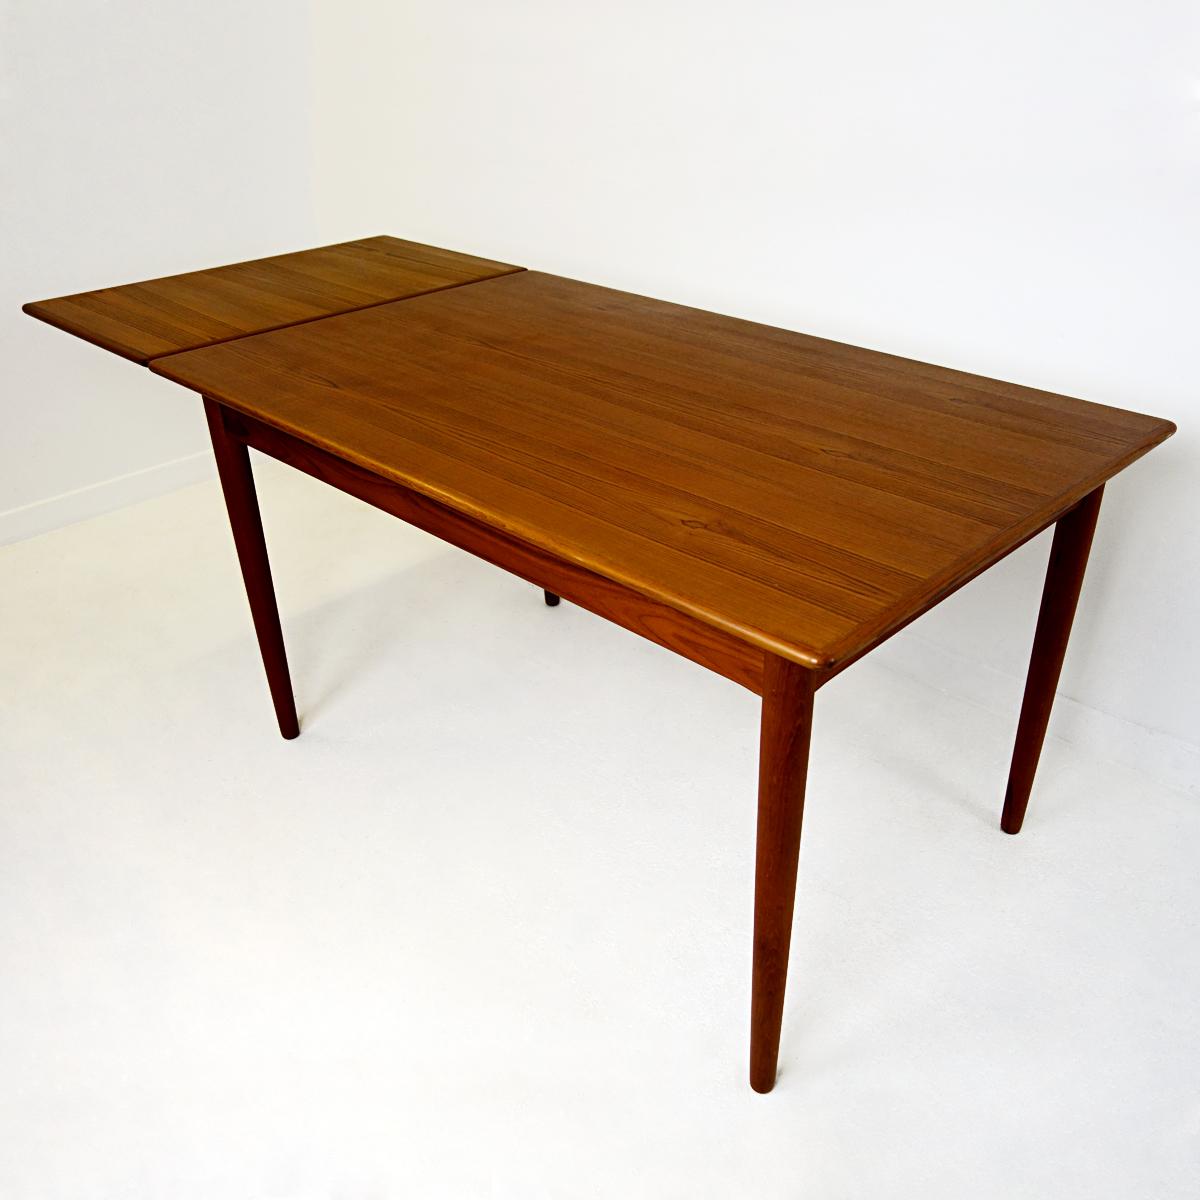 Image of: Mid Century Modern Teak And Oak Extendable Scandinavian Dining Table Doctor Decorum